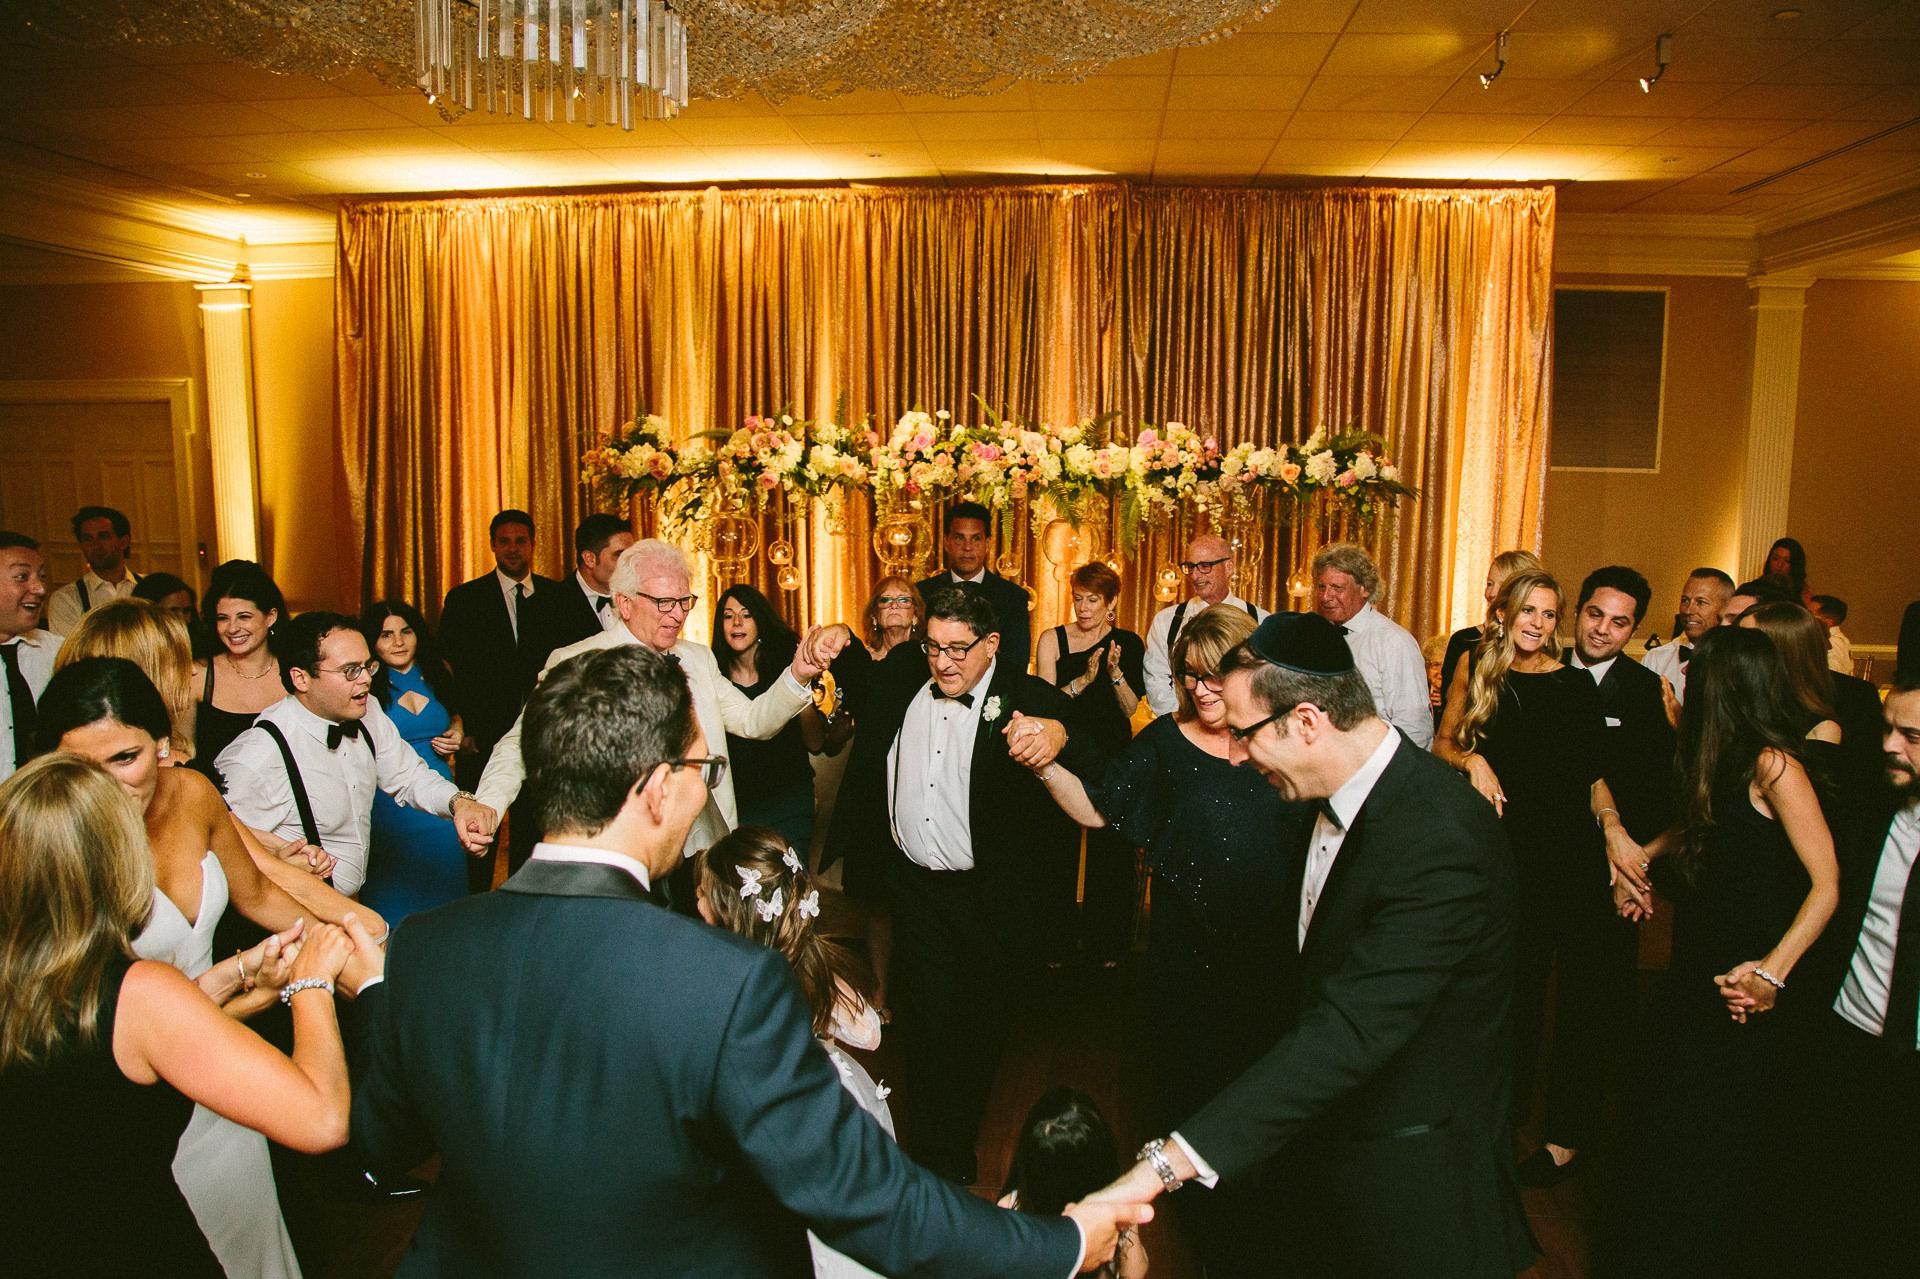 Beechmont Country Club Wedding Photographer in Beachwood 3 16.jpg